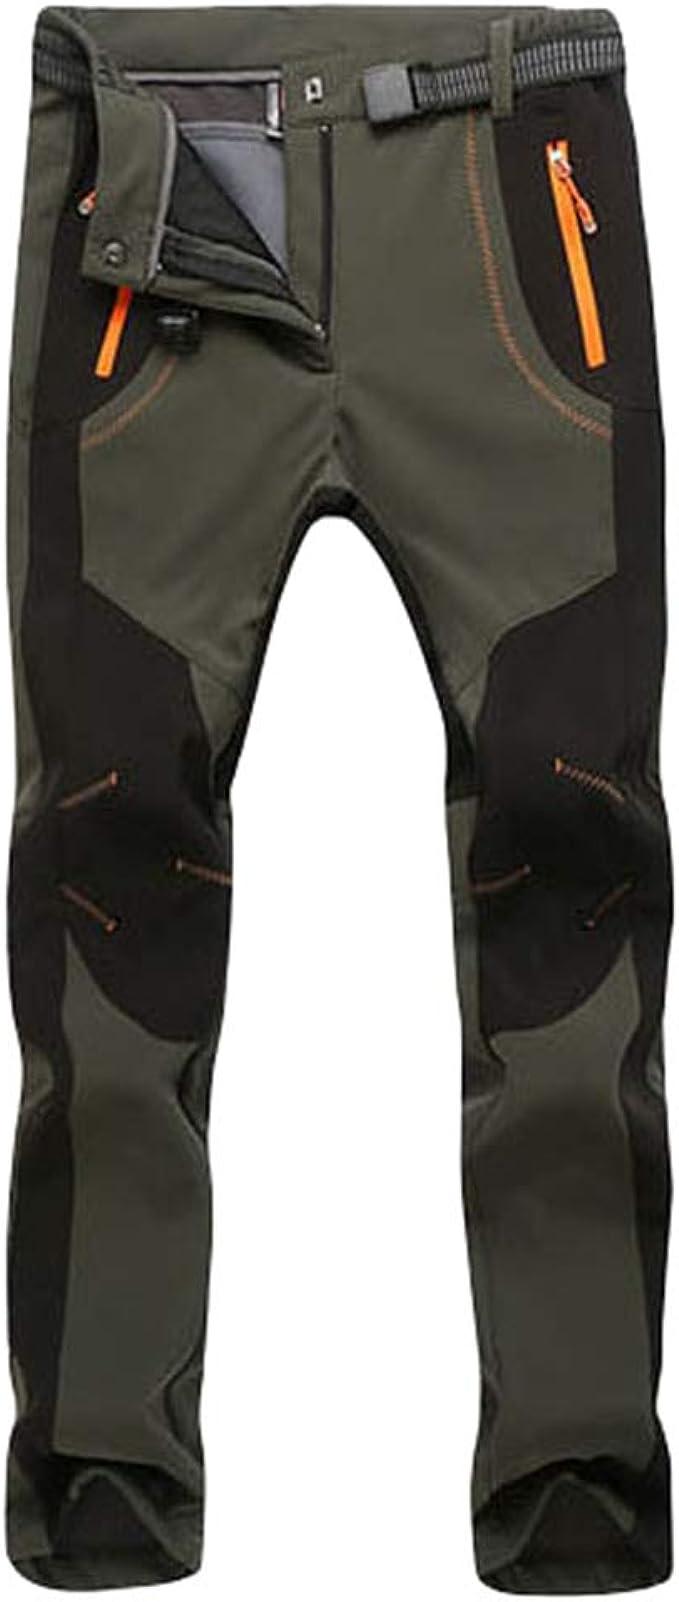 Cayuan Pantalón de Senderismo Invierno Acolchado Pantalones de Escalada Calentar Impermeable Ropa Deportiva